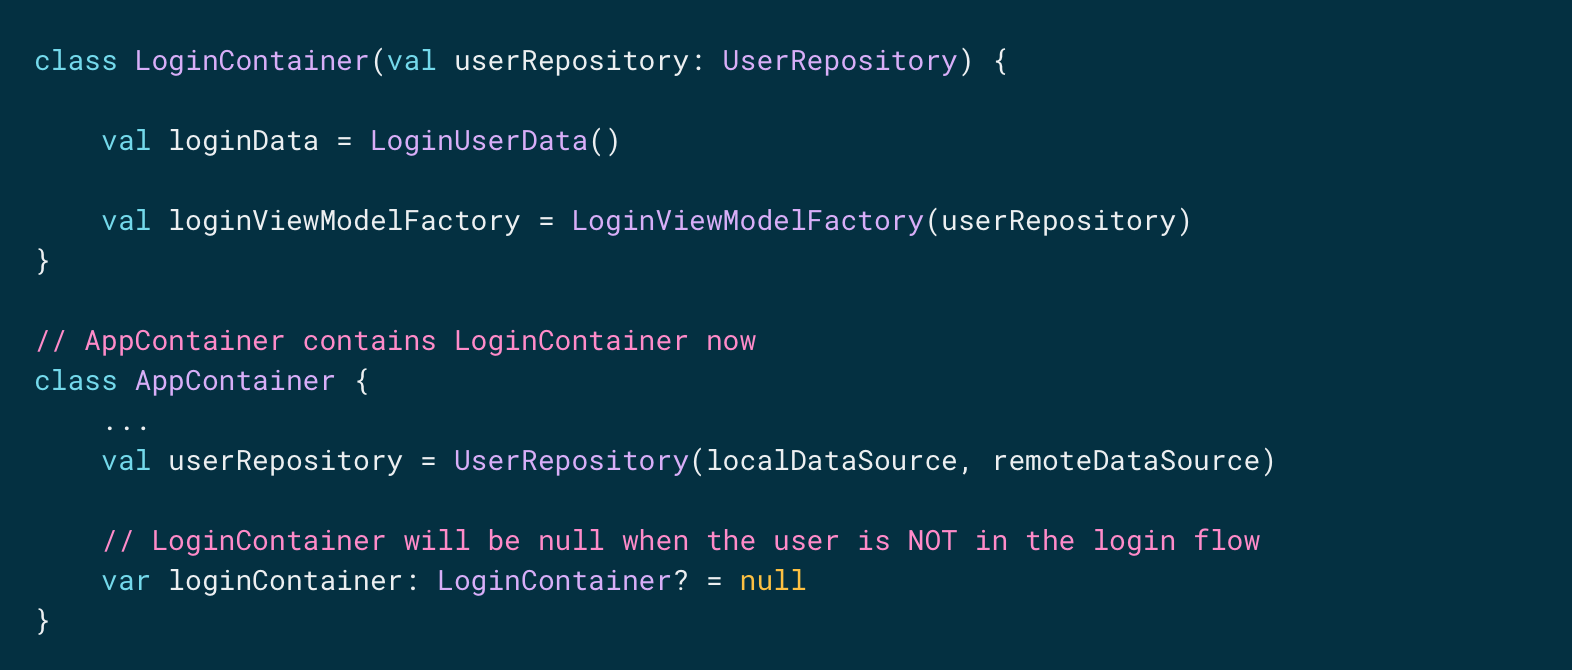 AppContainer contains LoginContainer